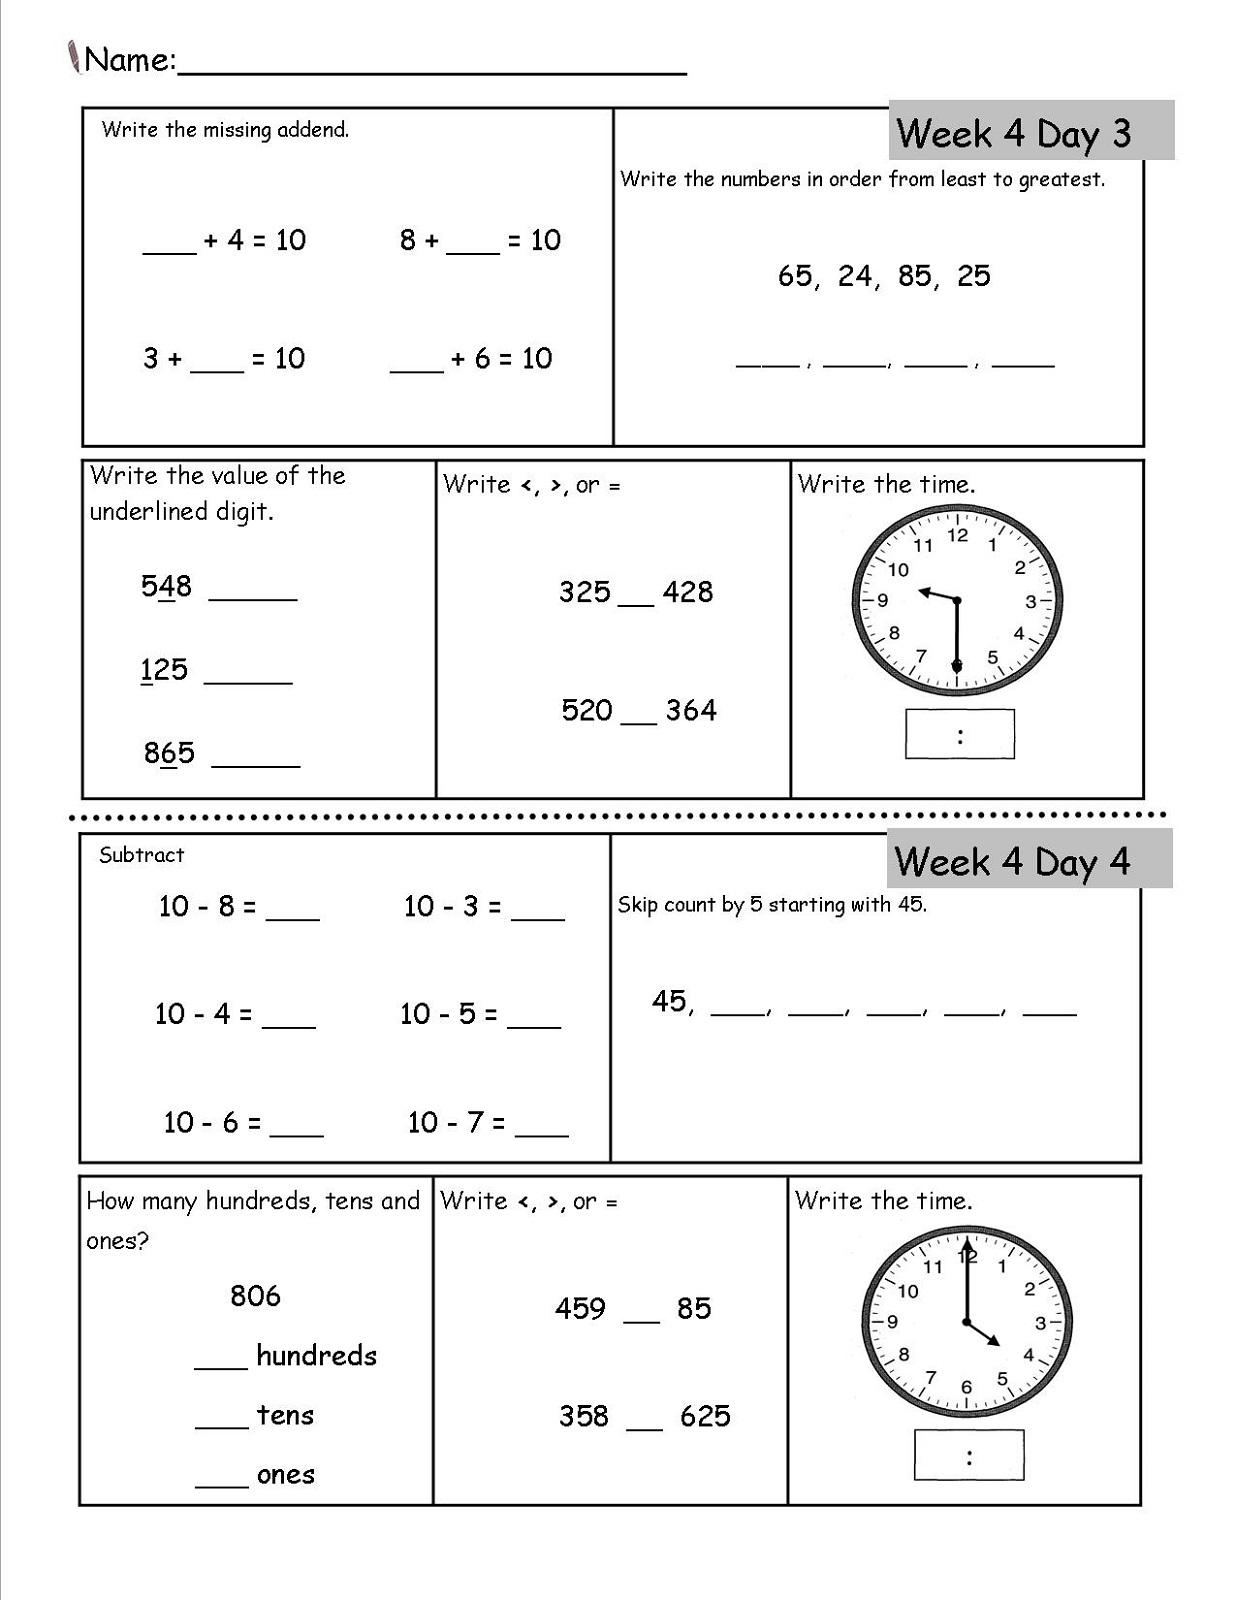 Fun 2nd Grade Math Worksheets Printable Educative Printable Math Review Worksheets 2nd Grade Math Worksheets 3rd Grade Math Worksheets